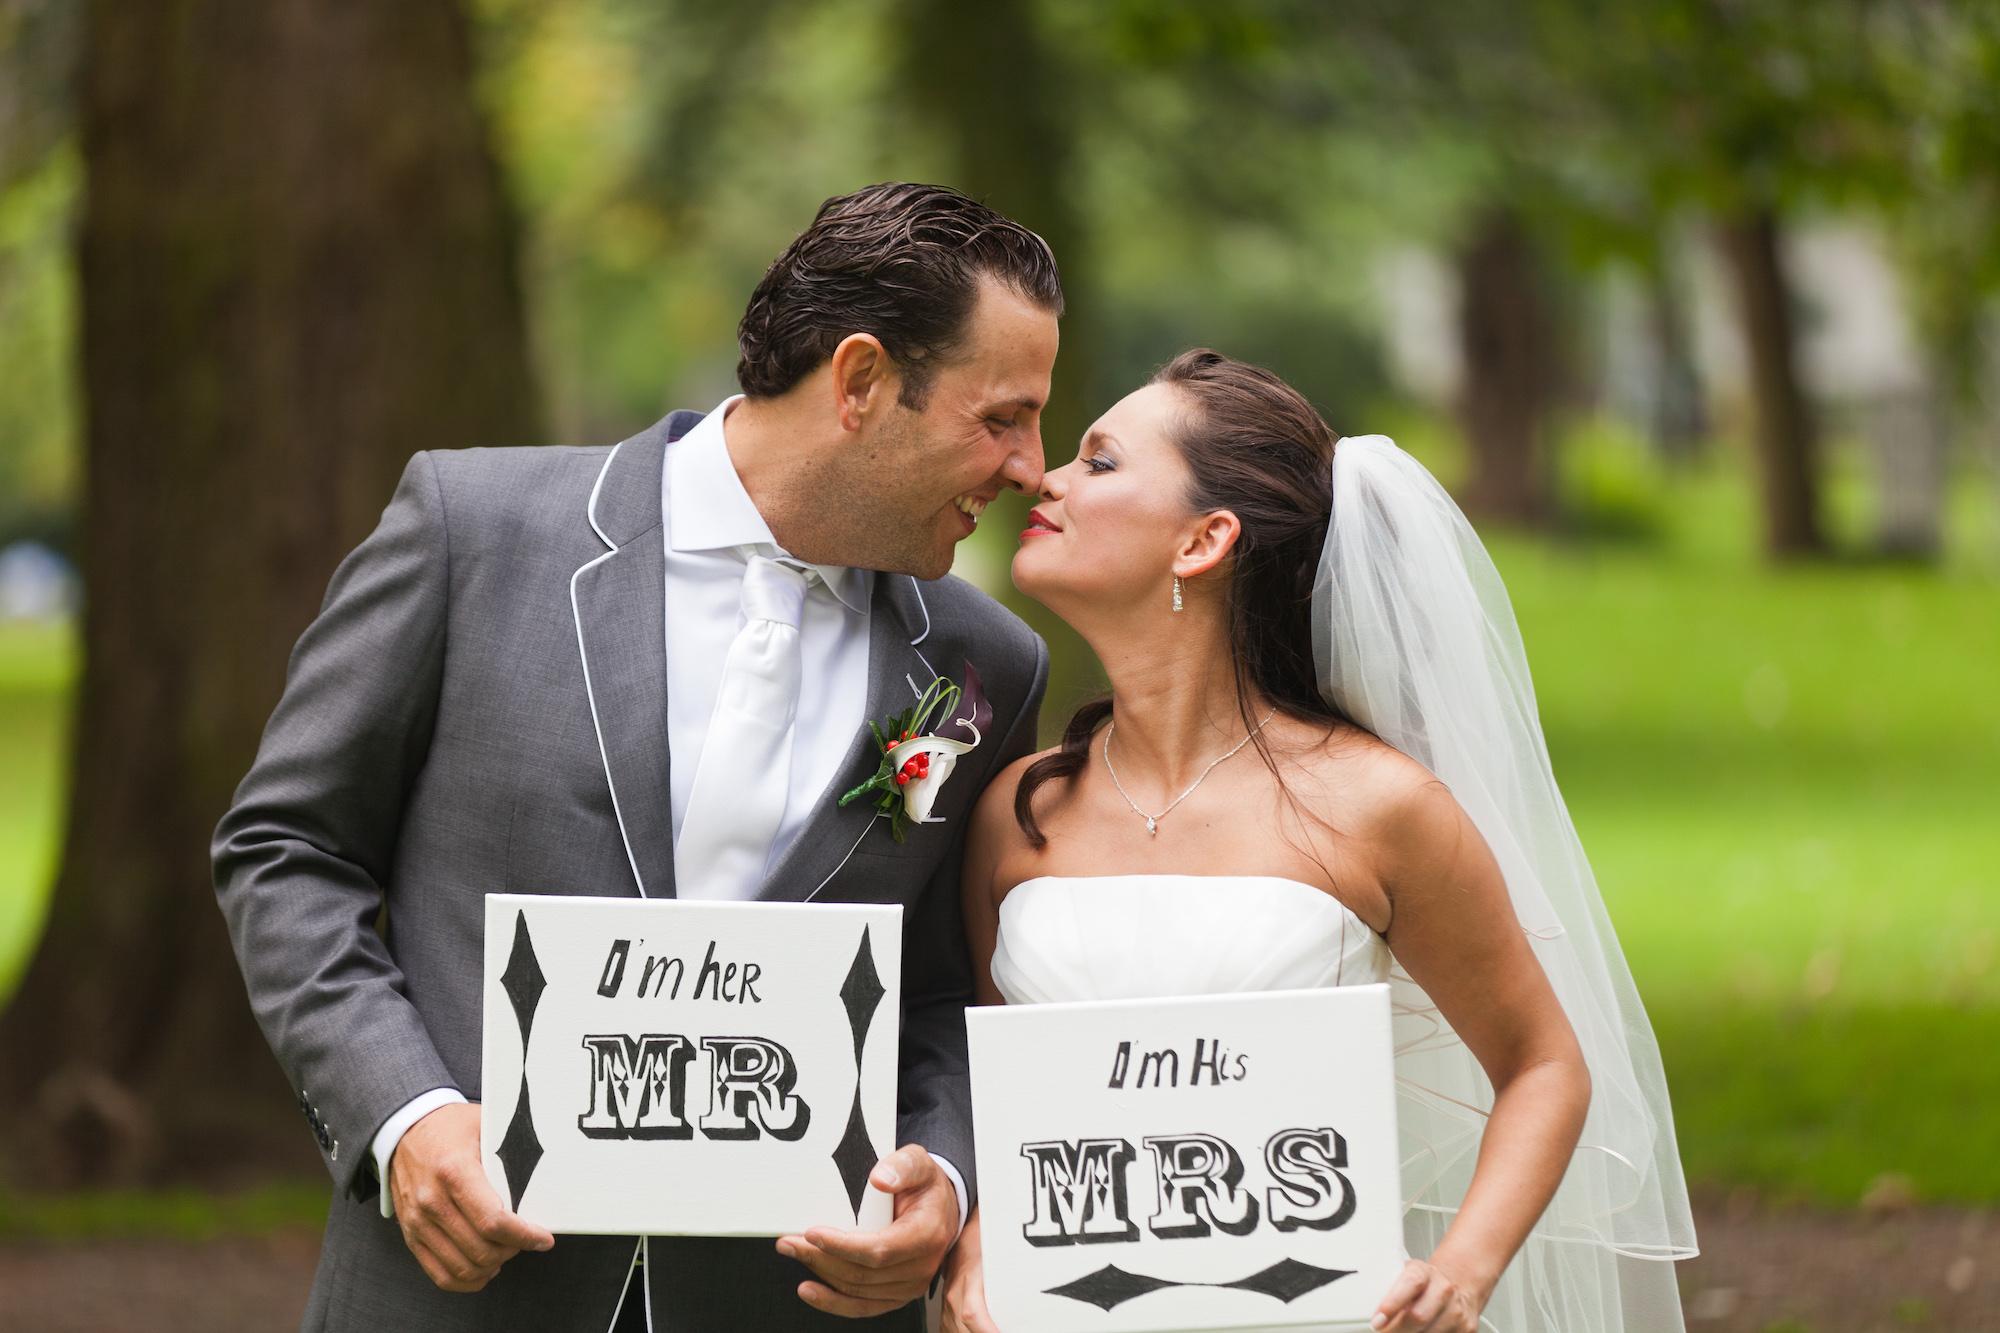 Real Wedding van het Bruidsmeisje op TPW